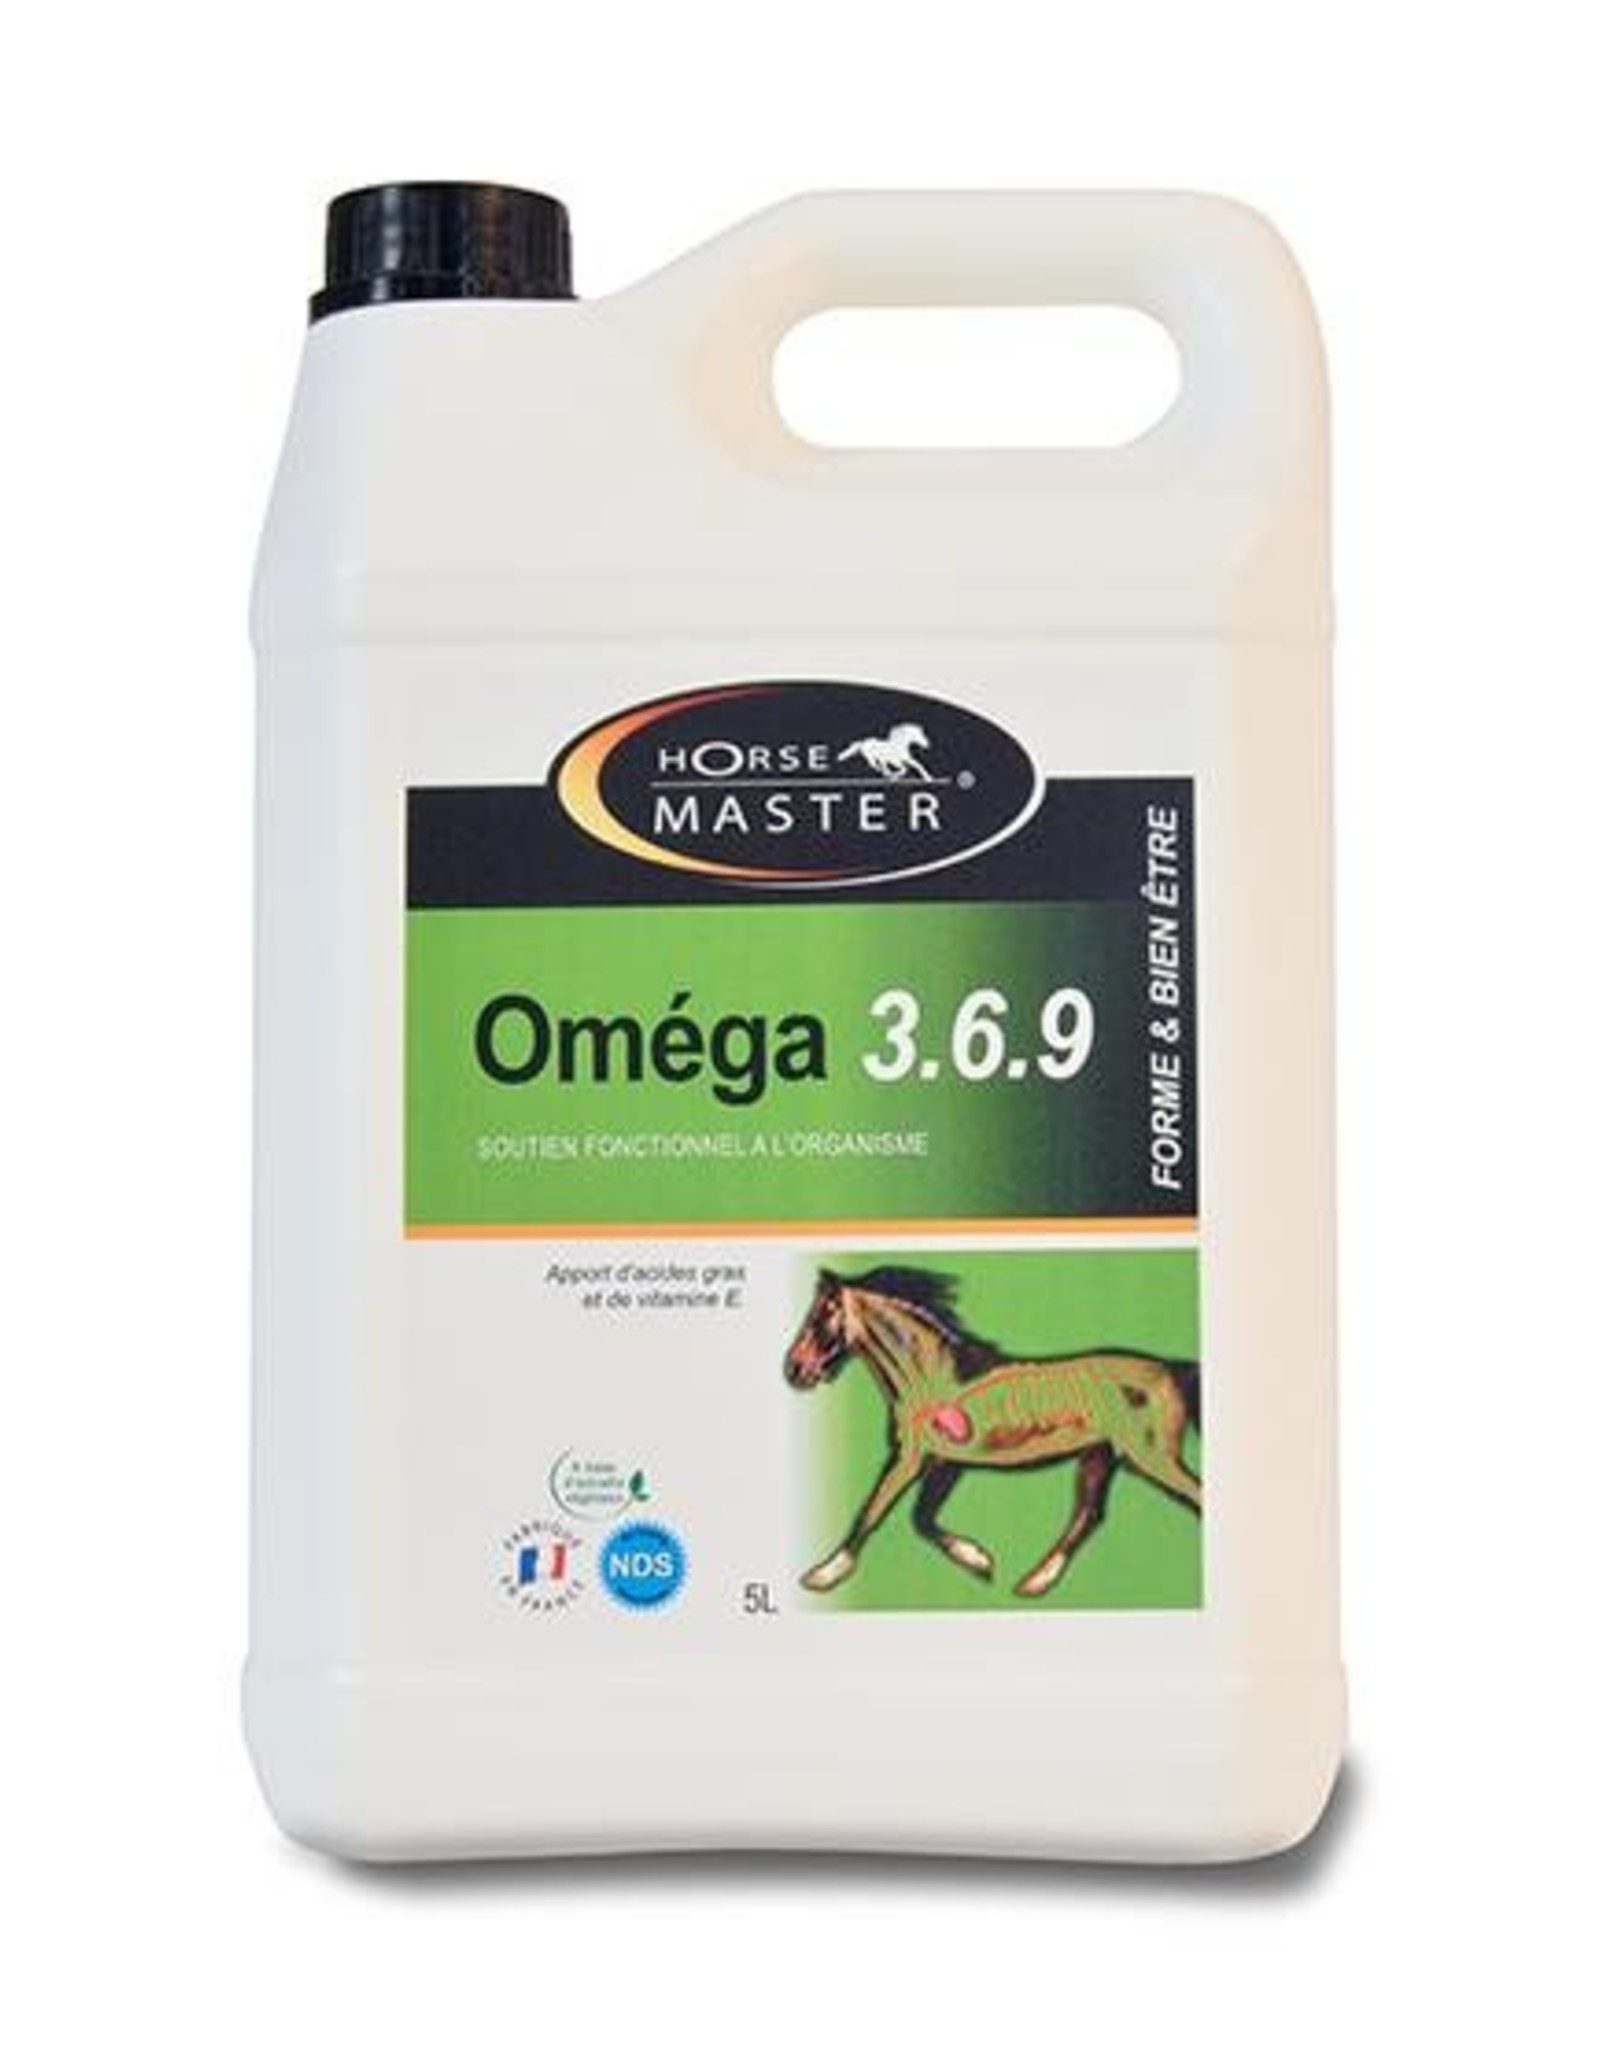 Horse Master Omega 3.6.9